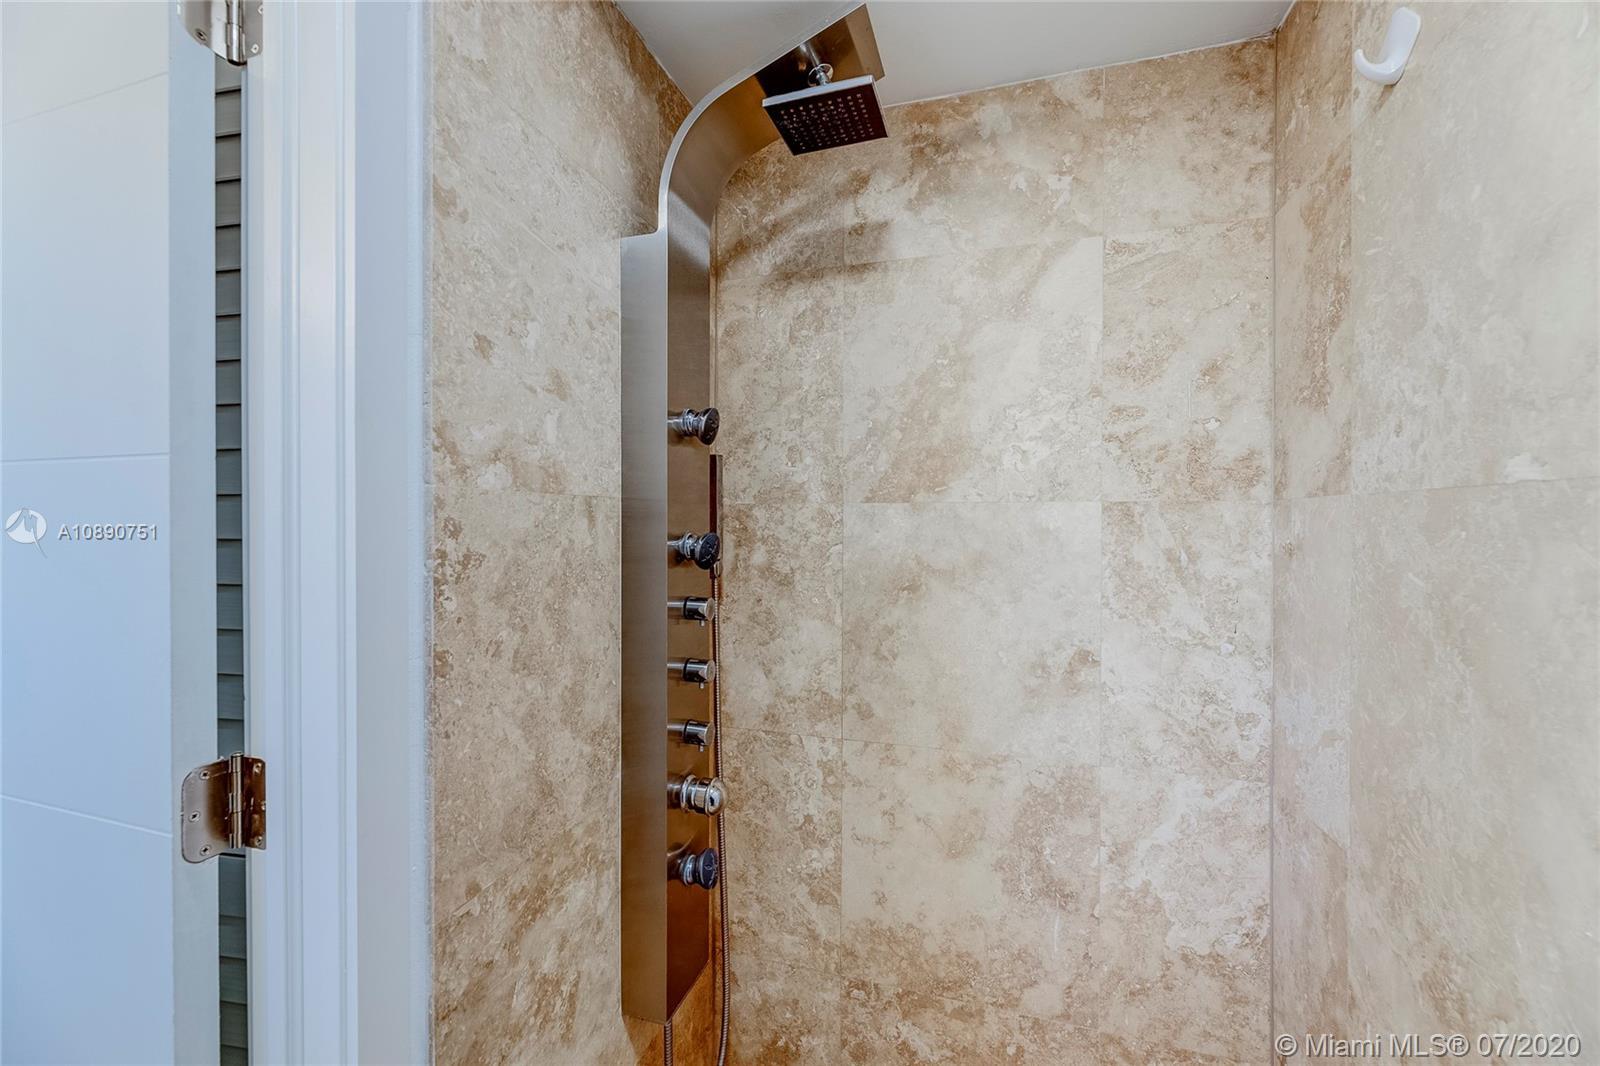 Photo of 425 Poinciana Island Drive #1444, Sunny Isles Beach, Florida, 33160 - Second room dressing area and en suite bathroom